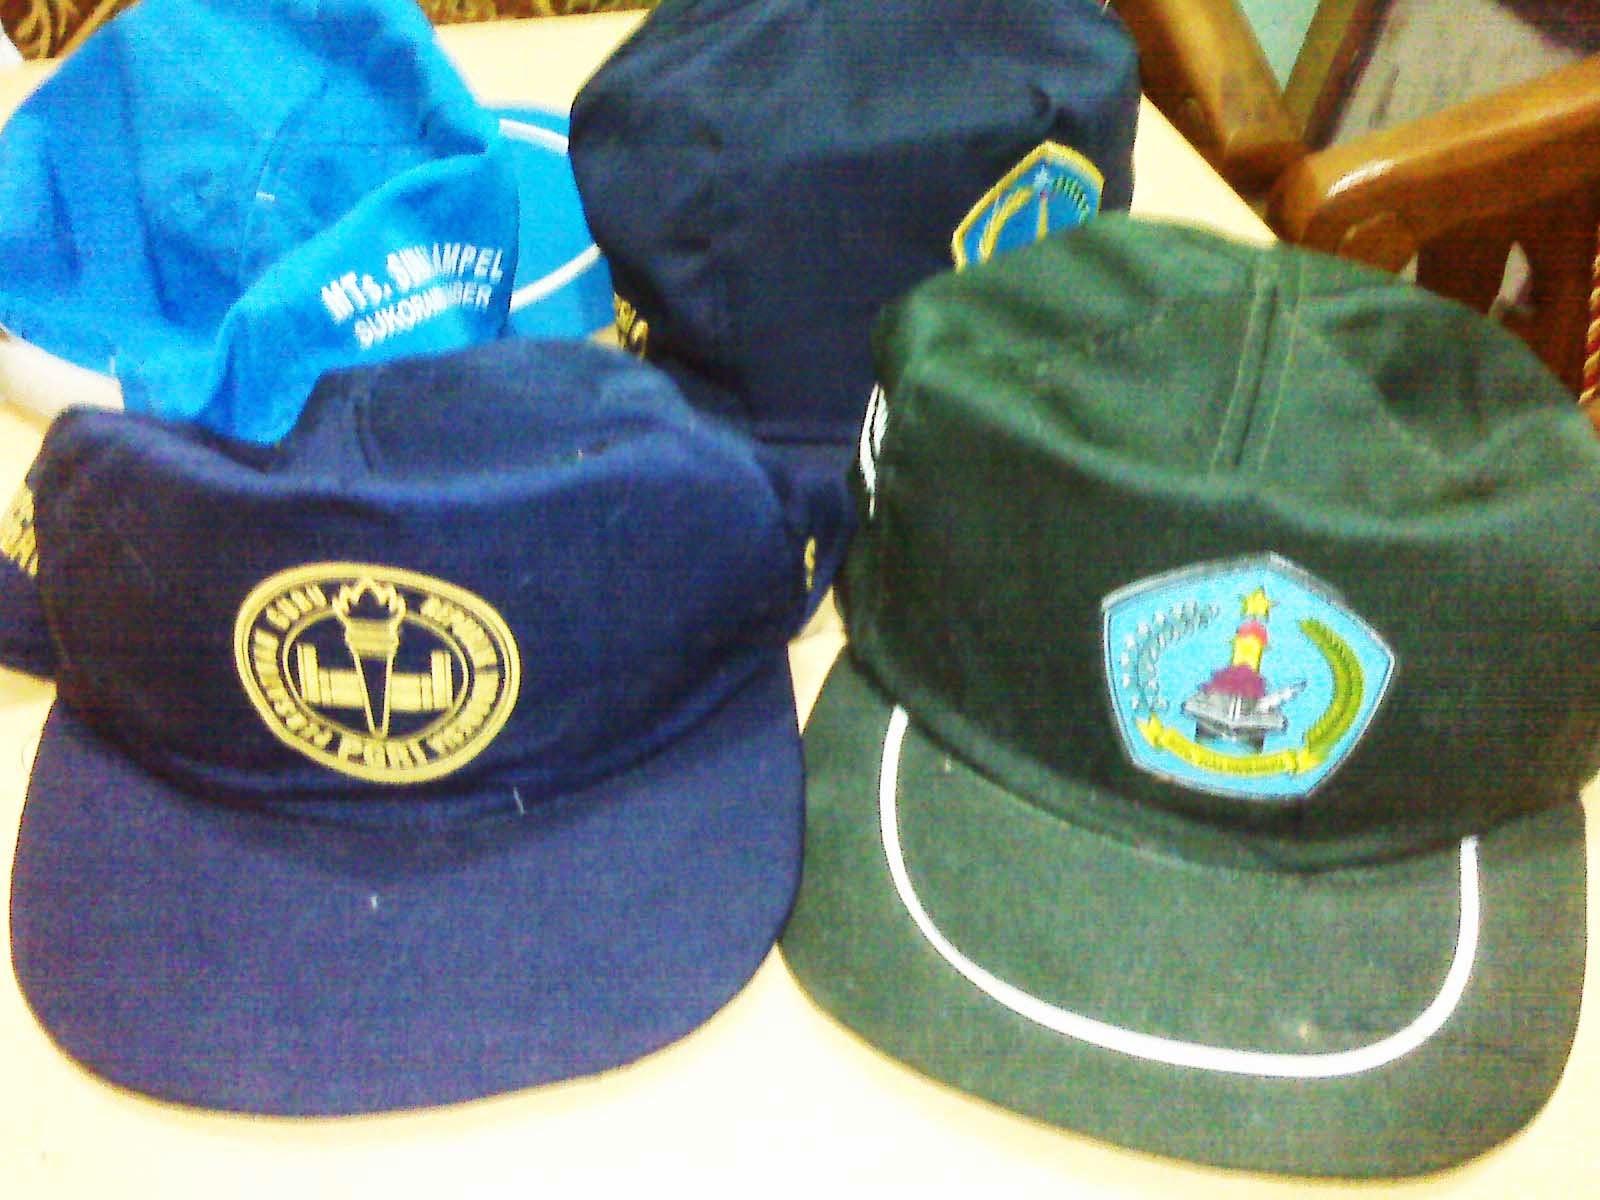 Grosir Topi Seragam Sekolah Murah Berlogo Bordir Sablon